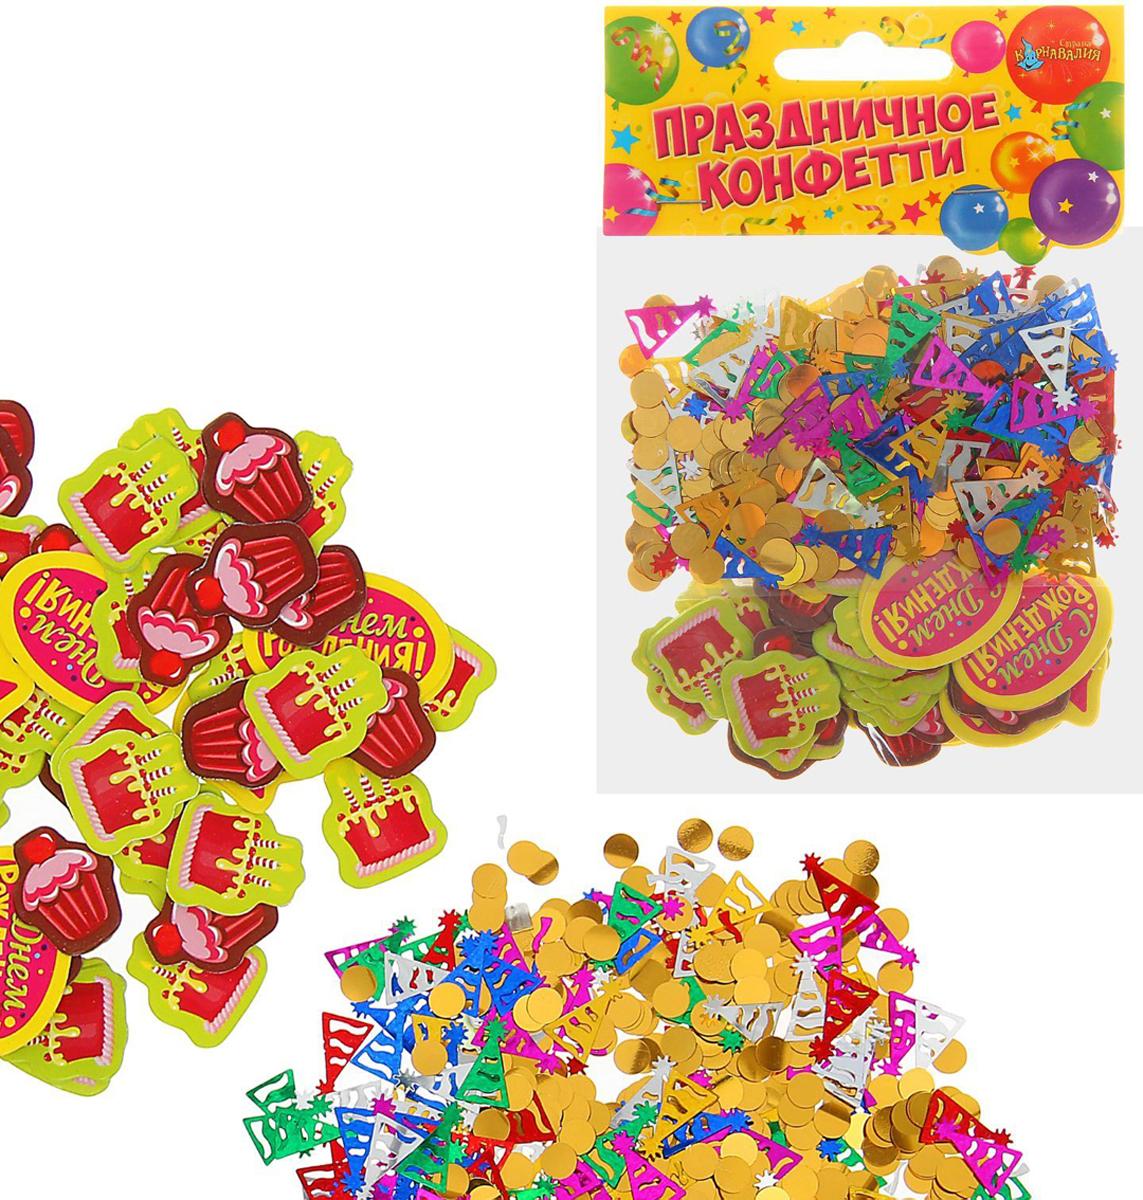 Страна Карнавалия Конфетти С днем рожденитортики набор 2 пакета + бумажное конфетти 1134844 -  Конфетти